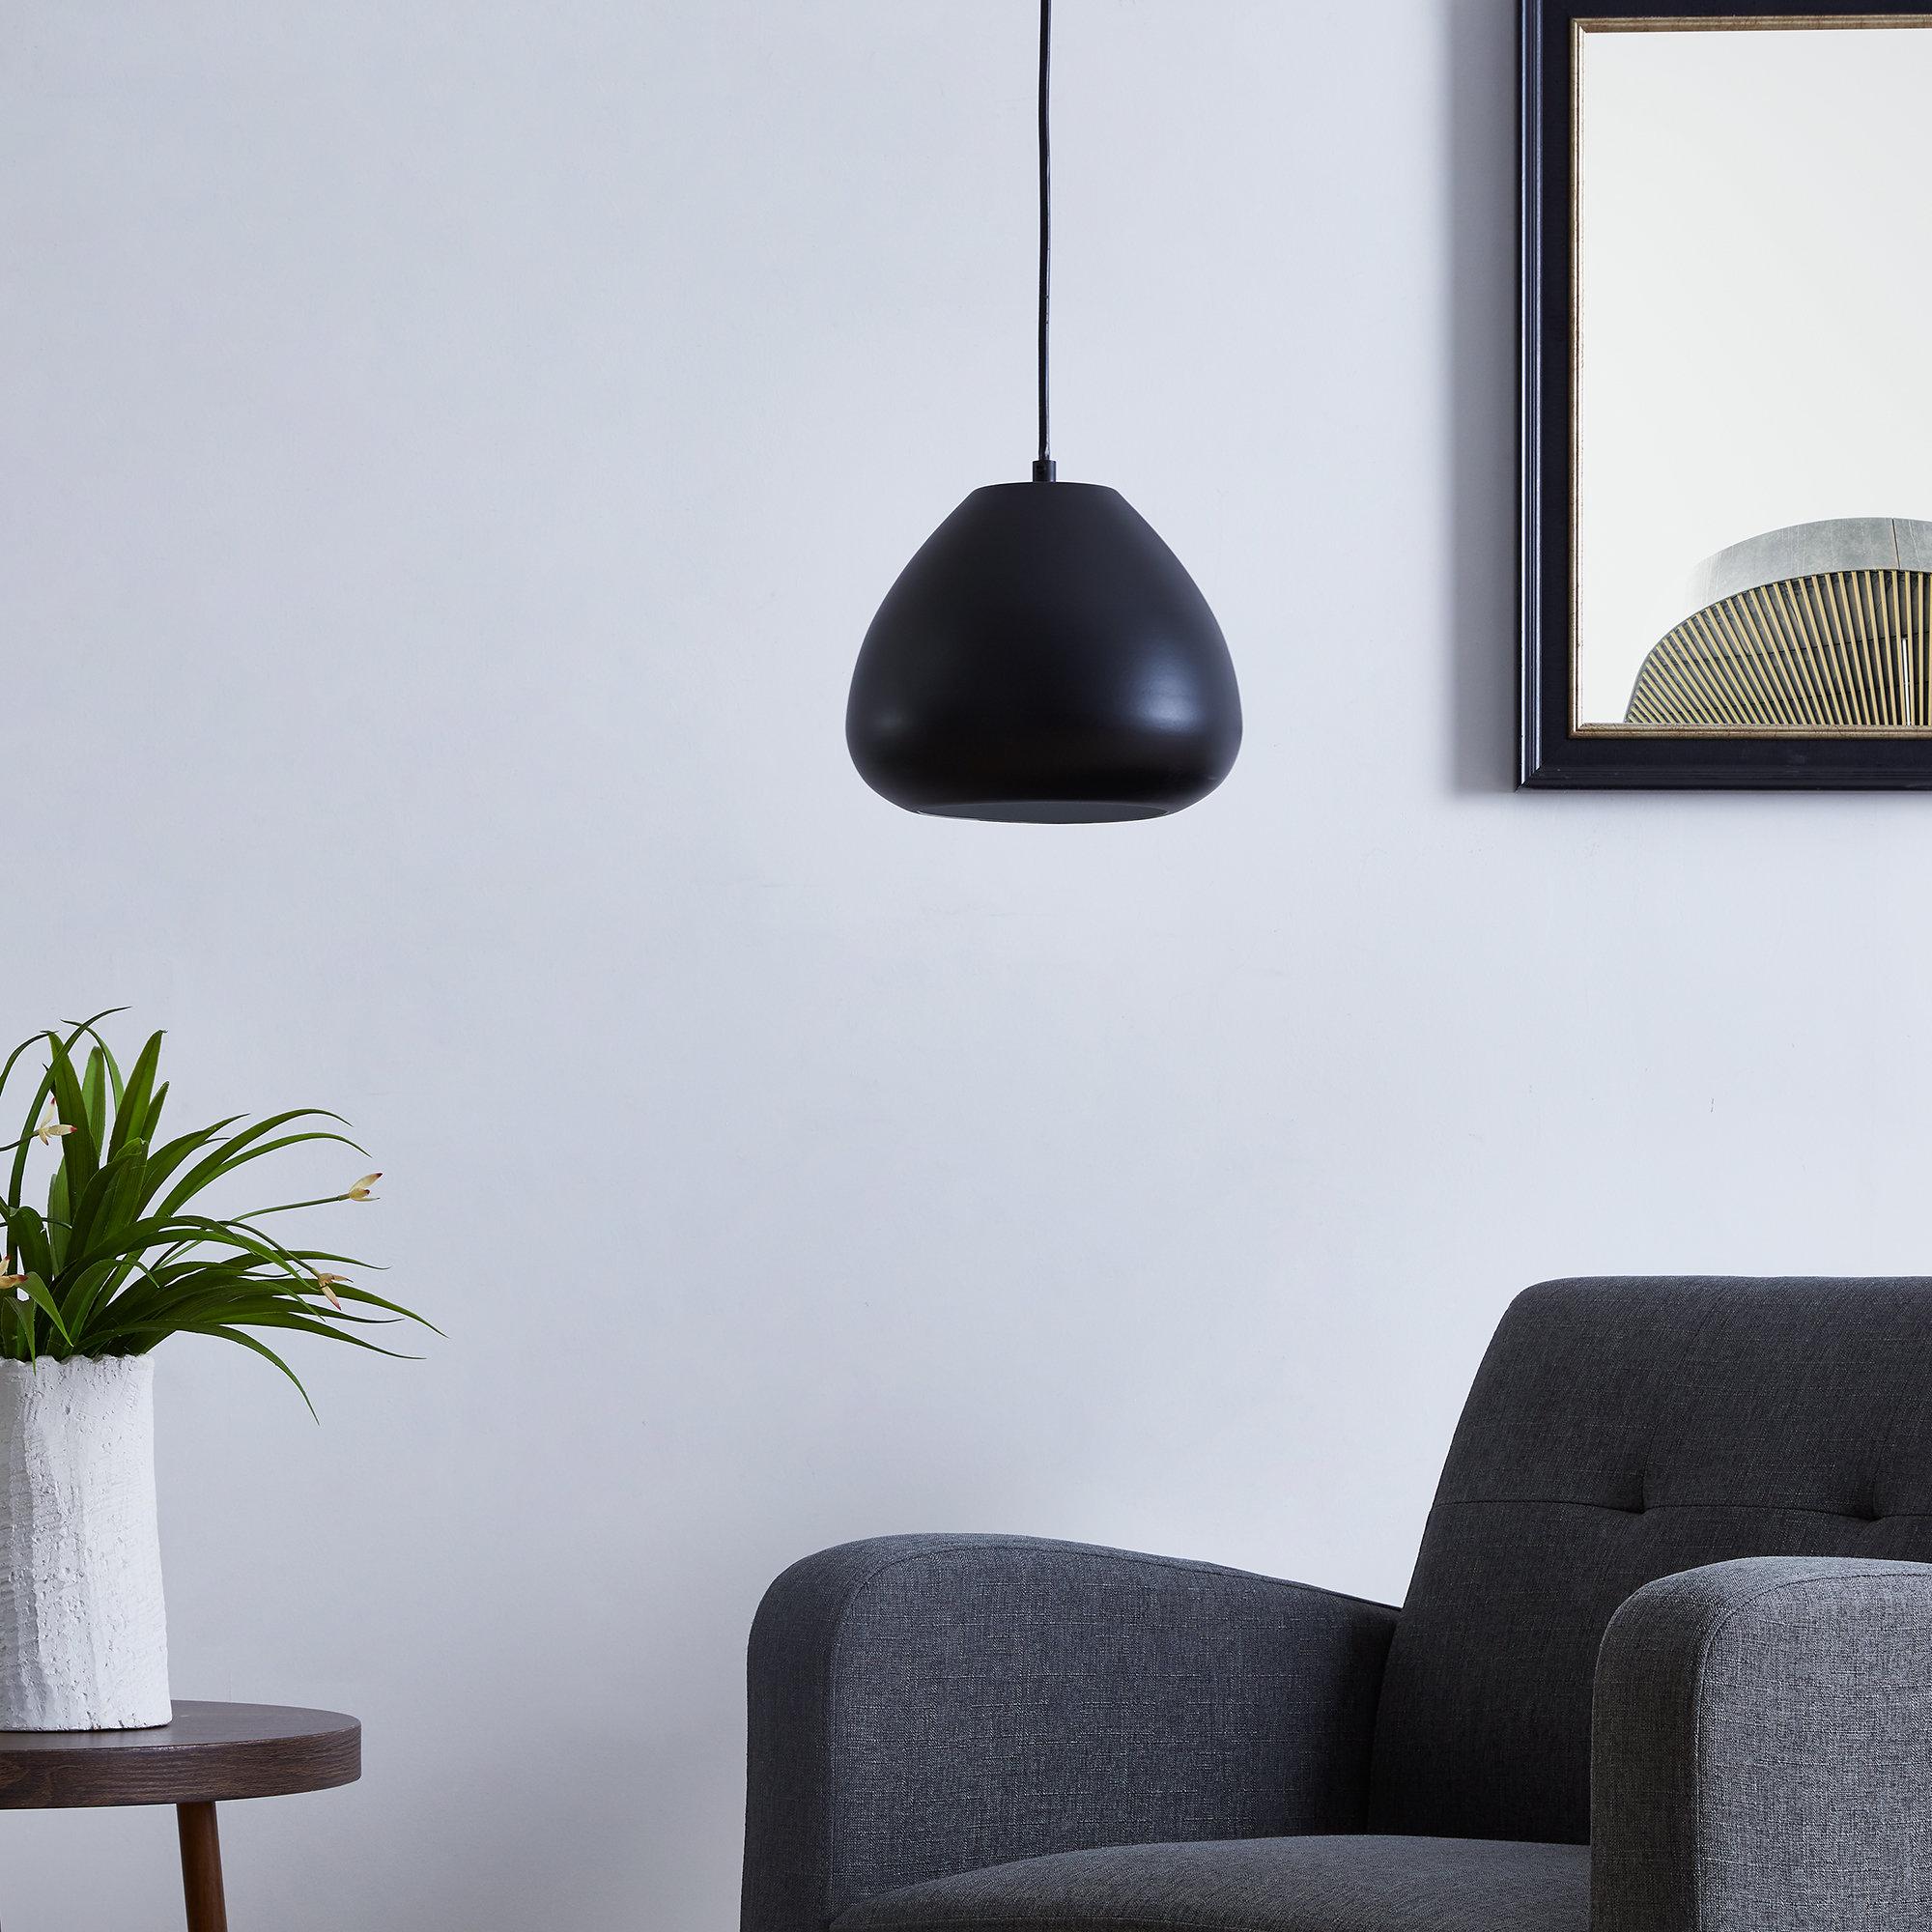 2019 Thomasson 1 Light Single Dome Pendant Inside Ryker 1 Light Single Dome Pendants (Gallery 5 of 20)